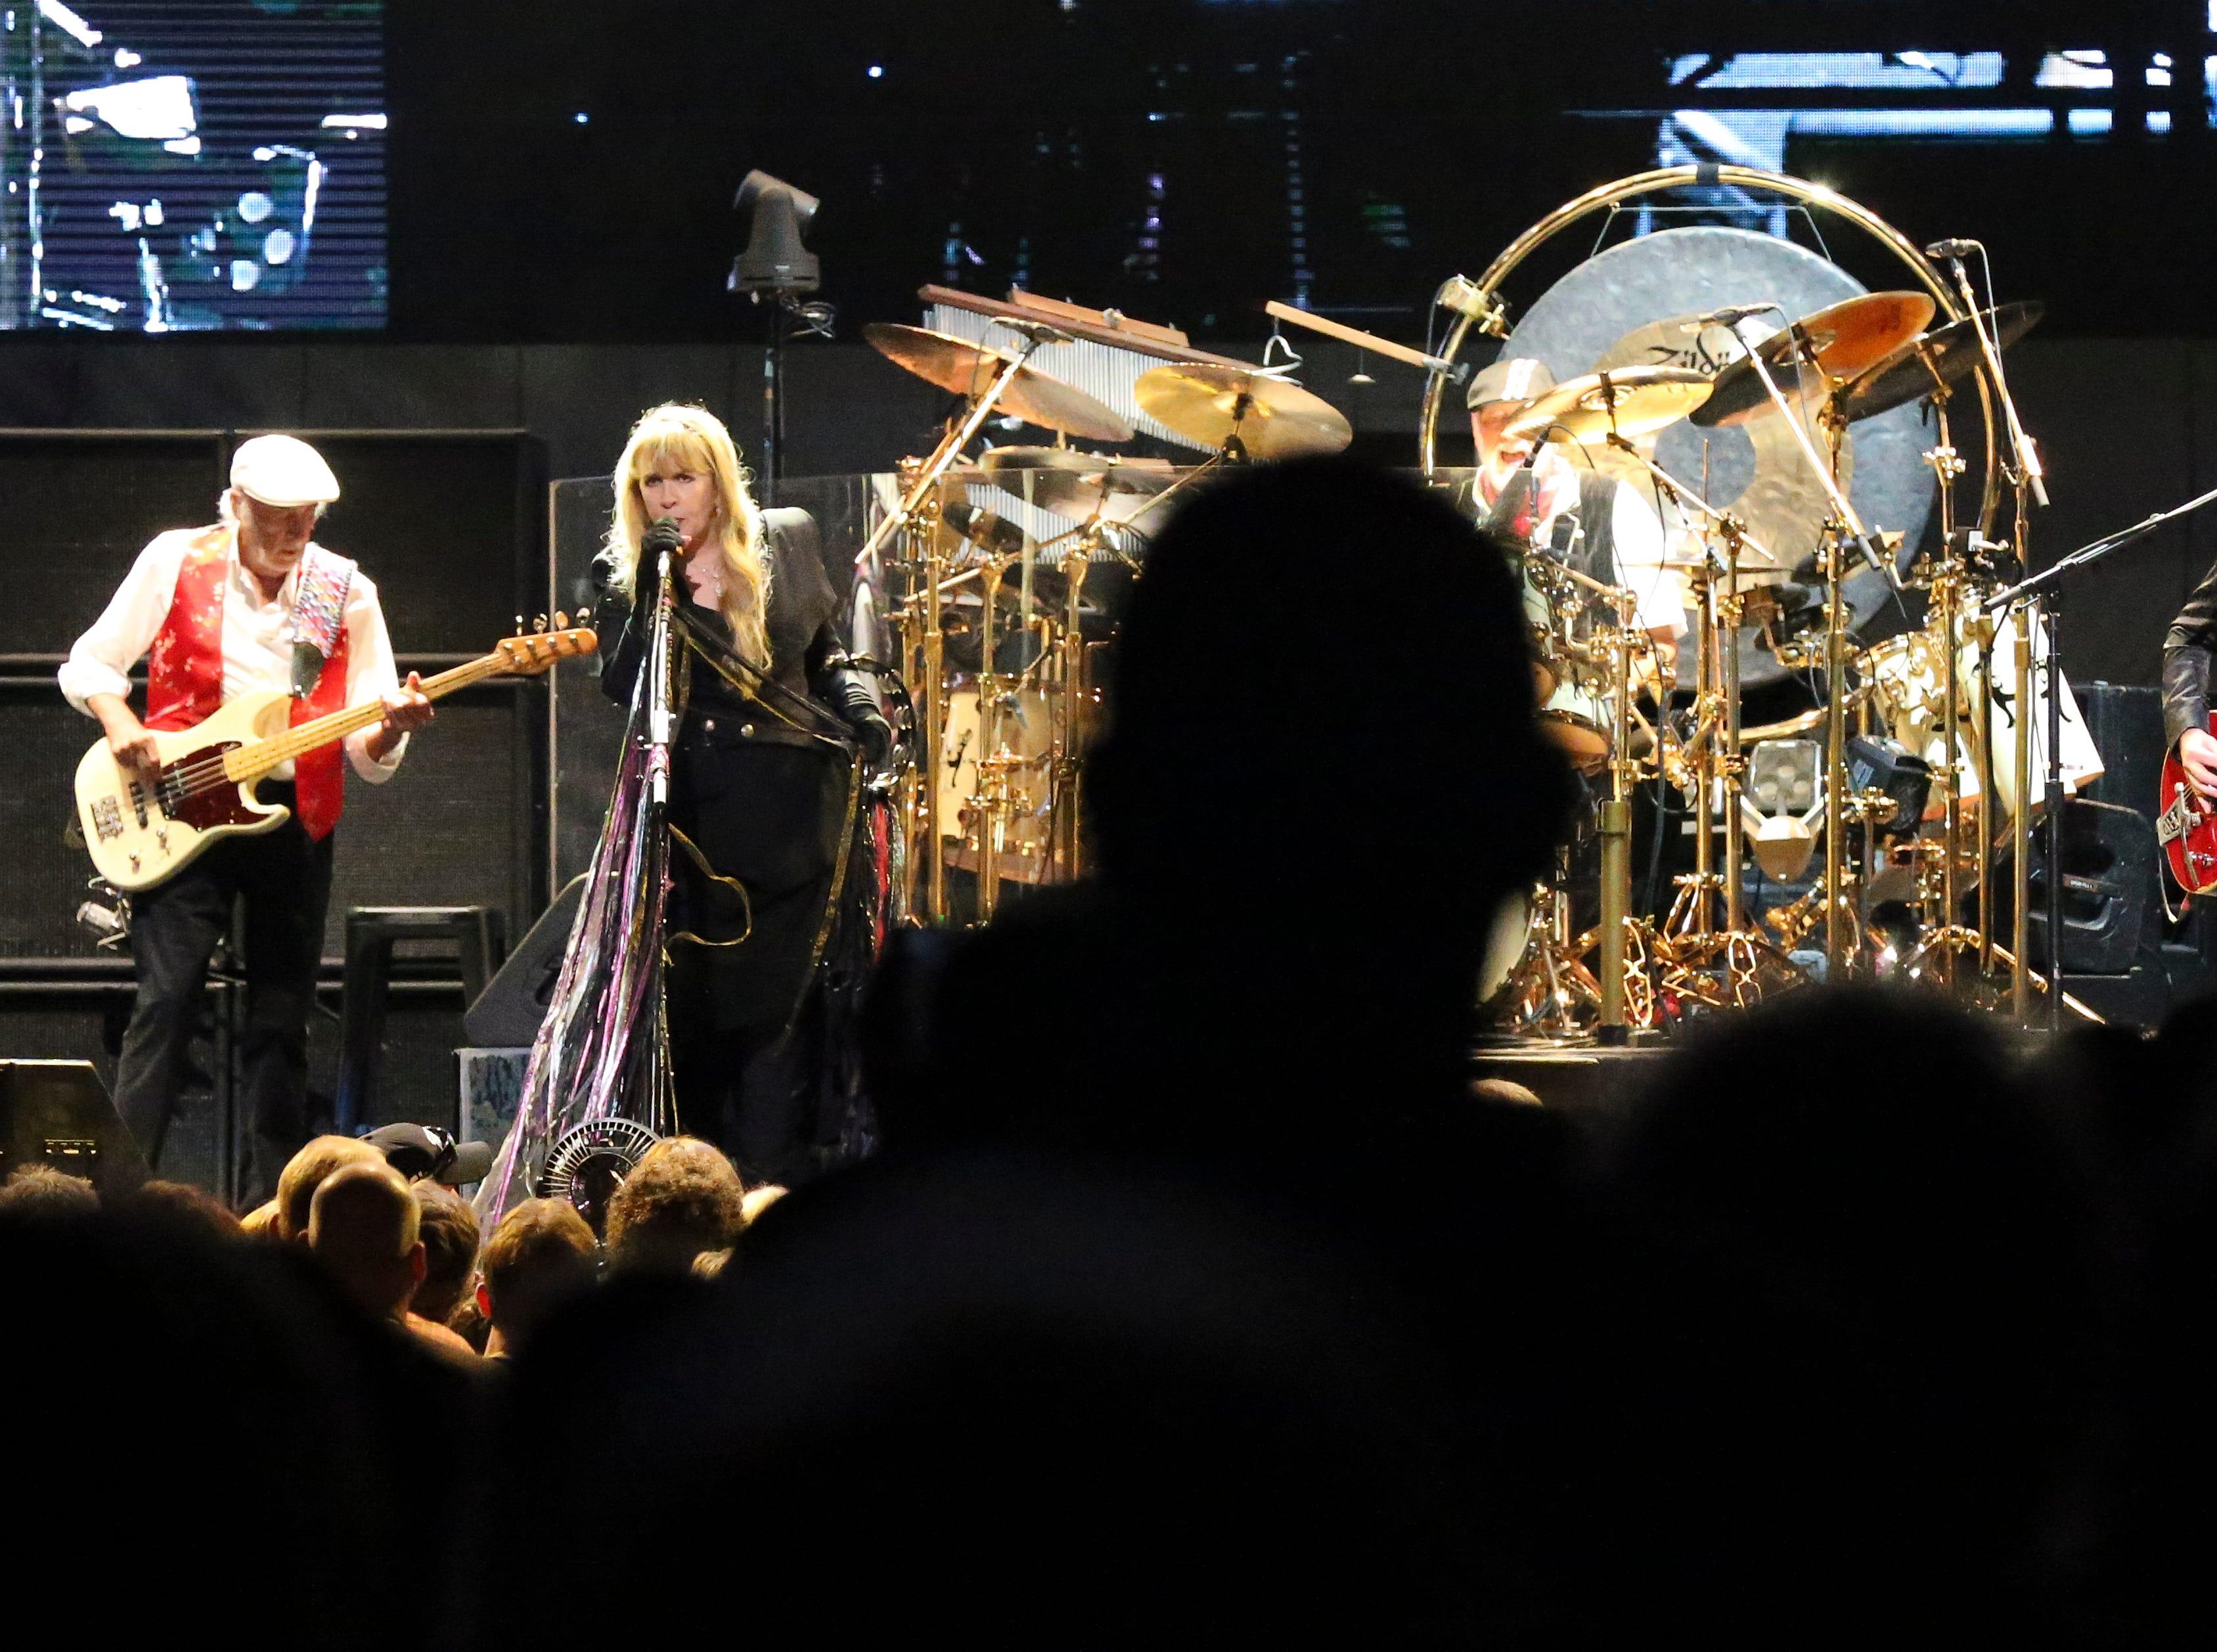 Fleetwood Mac concert postponed to February